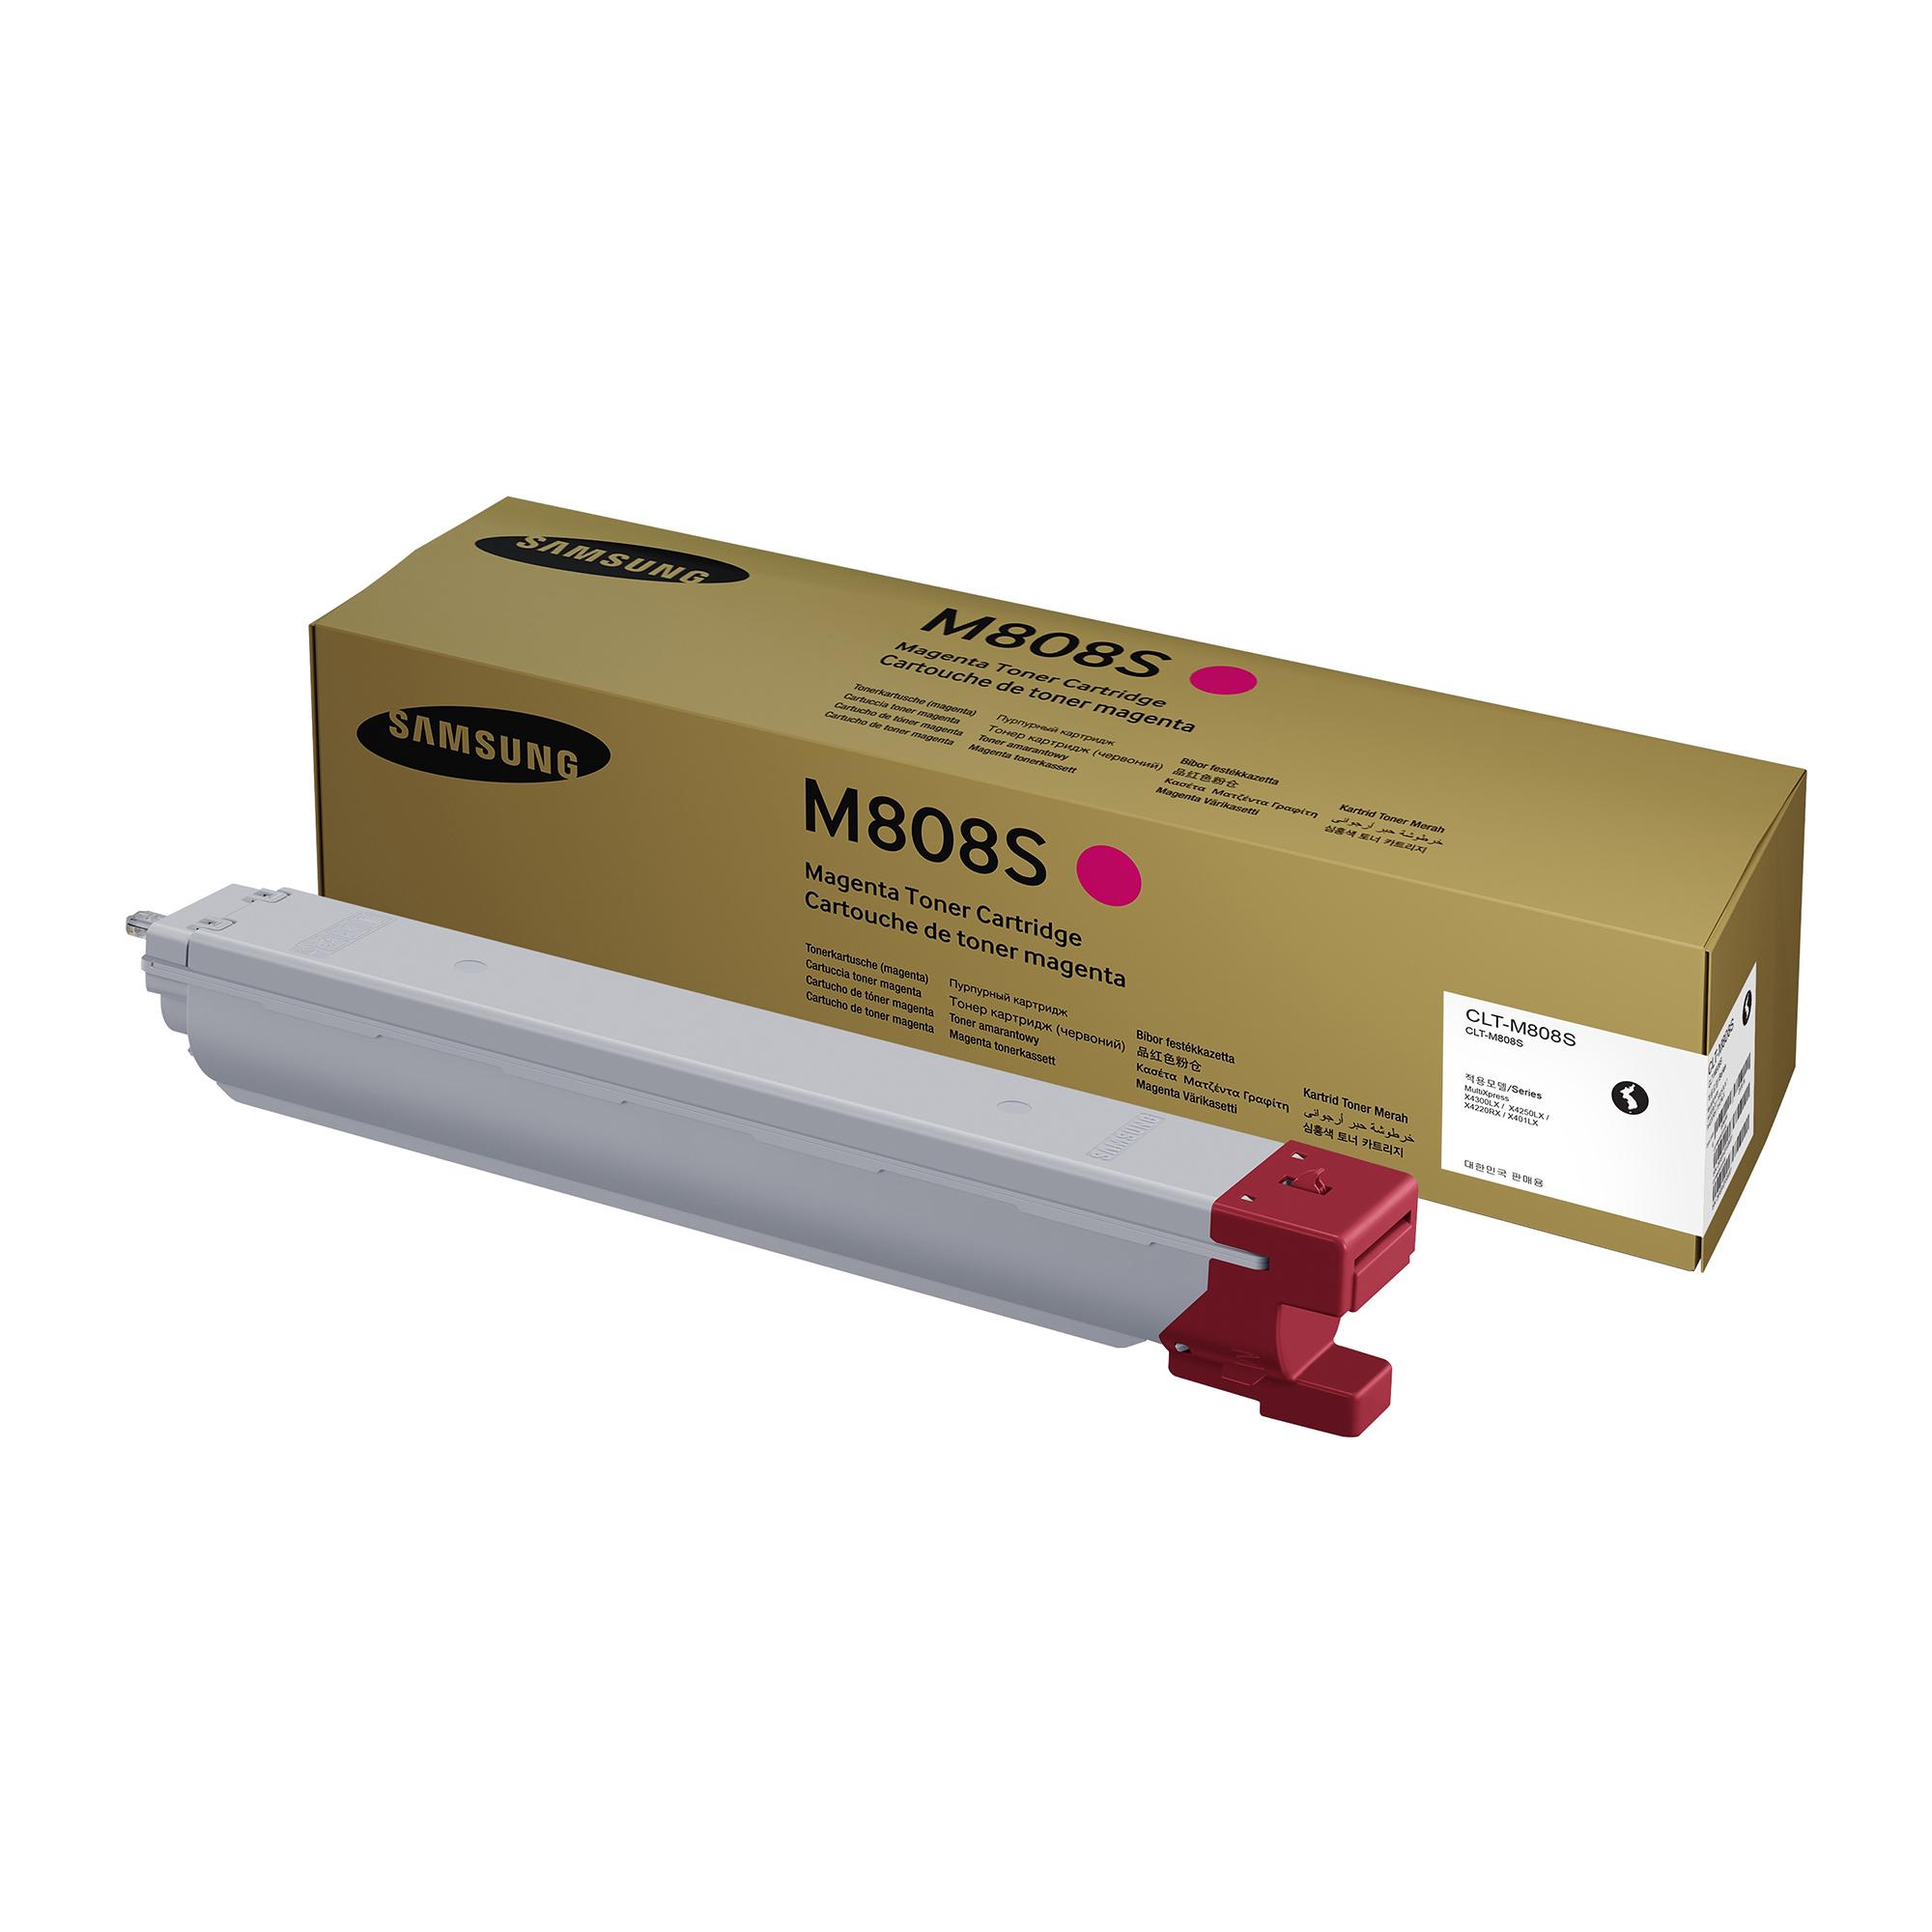 Samsung CLT-M808S Laser Toner Cartridge Page Life 20000pp Magenta Ref SS642A